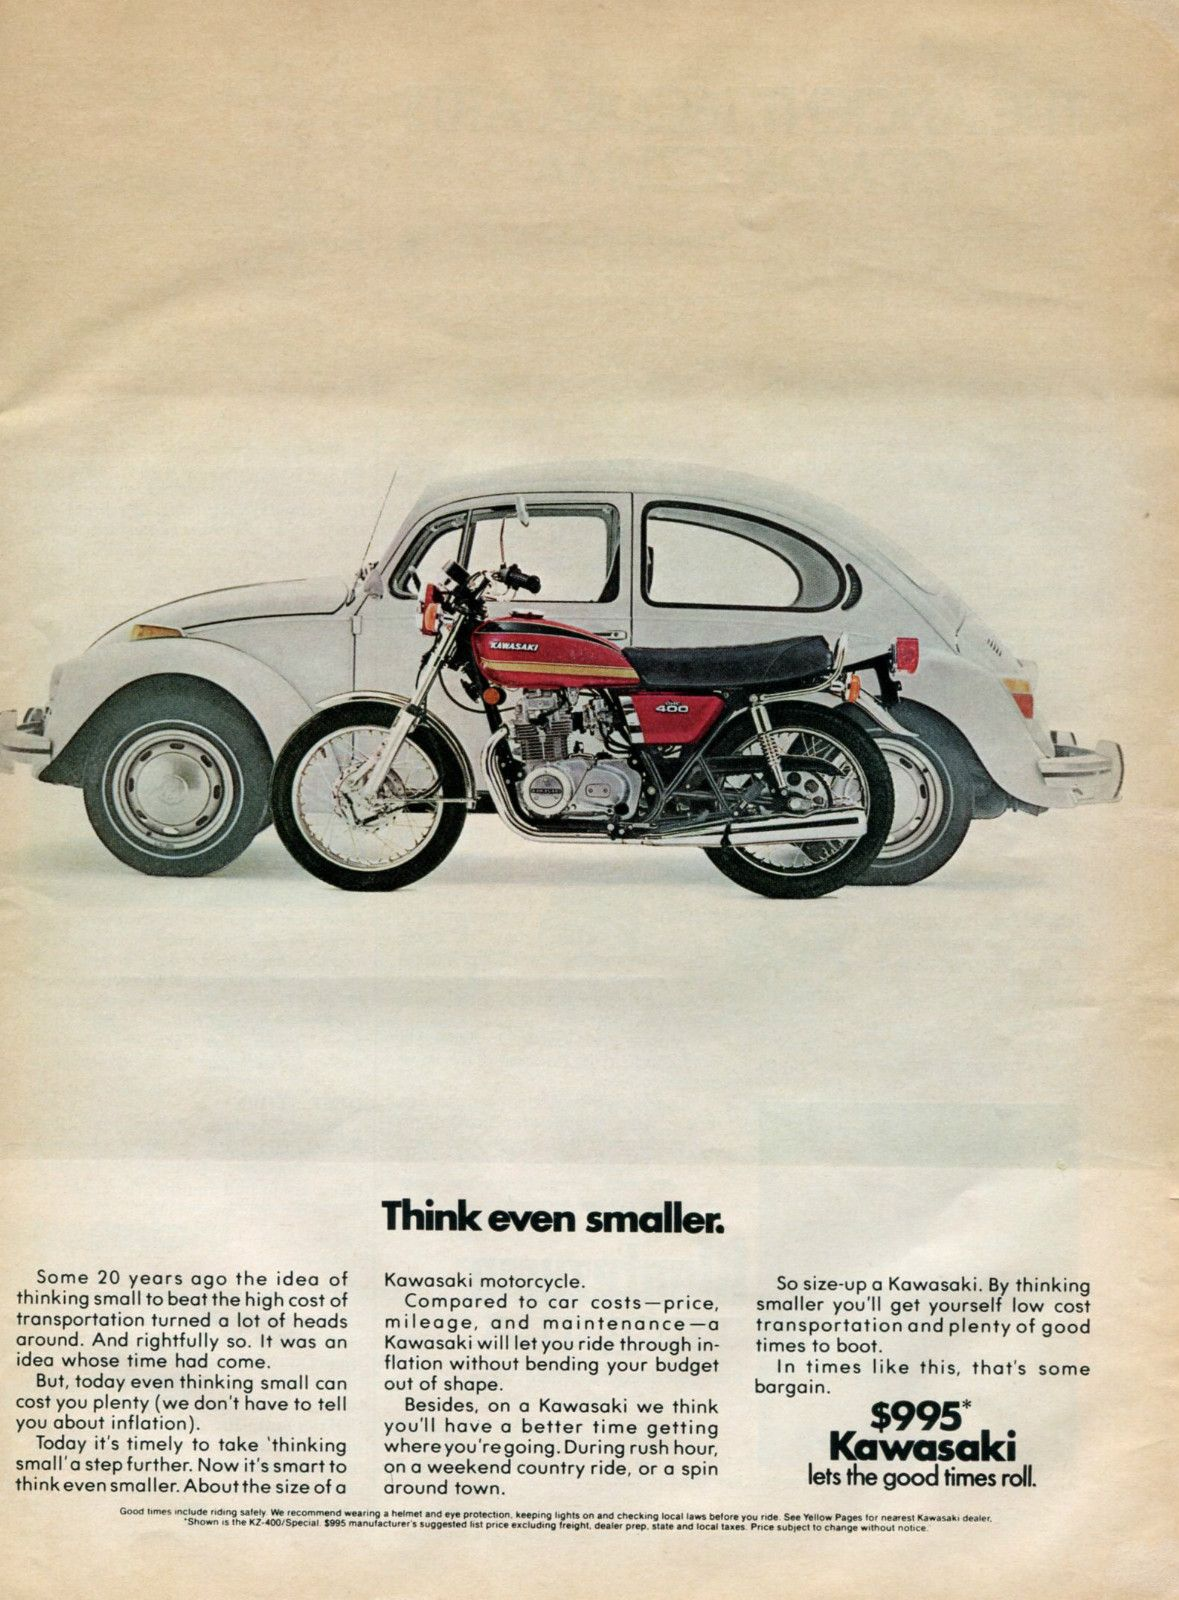 1975 KAWASAKI VW Beetle Size Comparison Motorcycle Retro